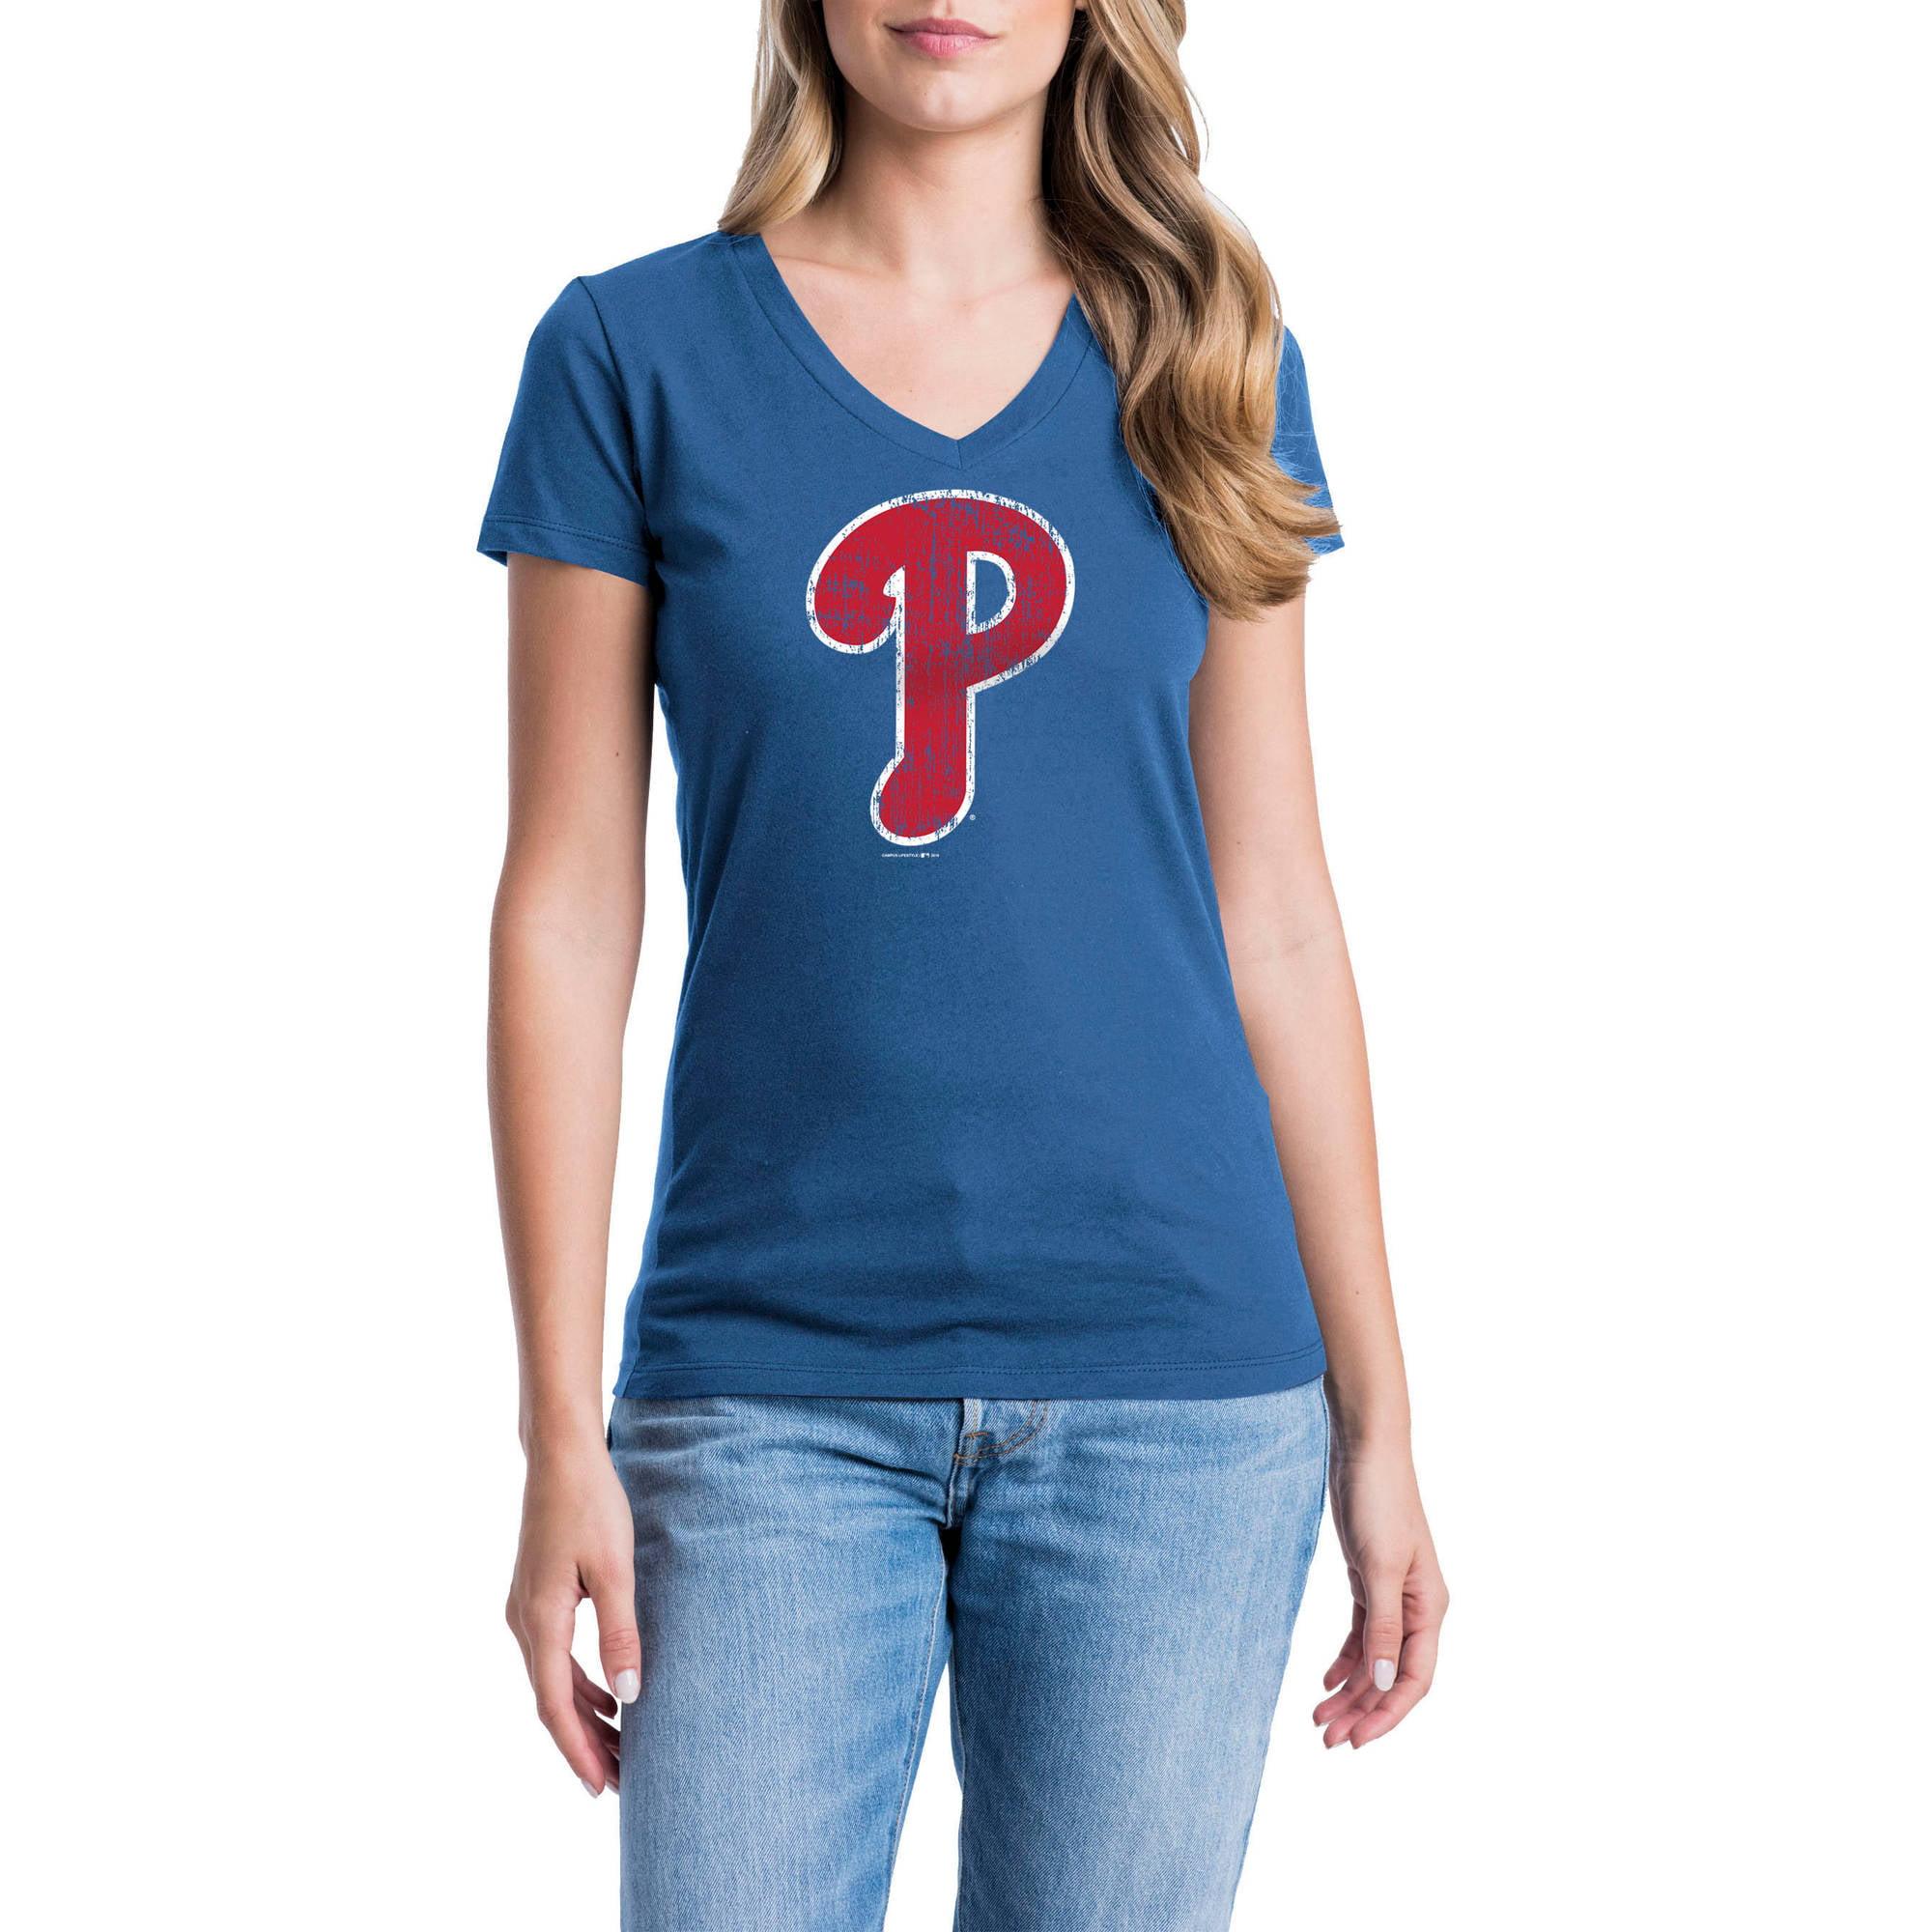 Philadelphia Phillies Womens Short Sleeve Graphic Tee